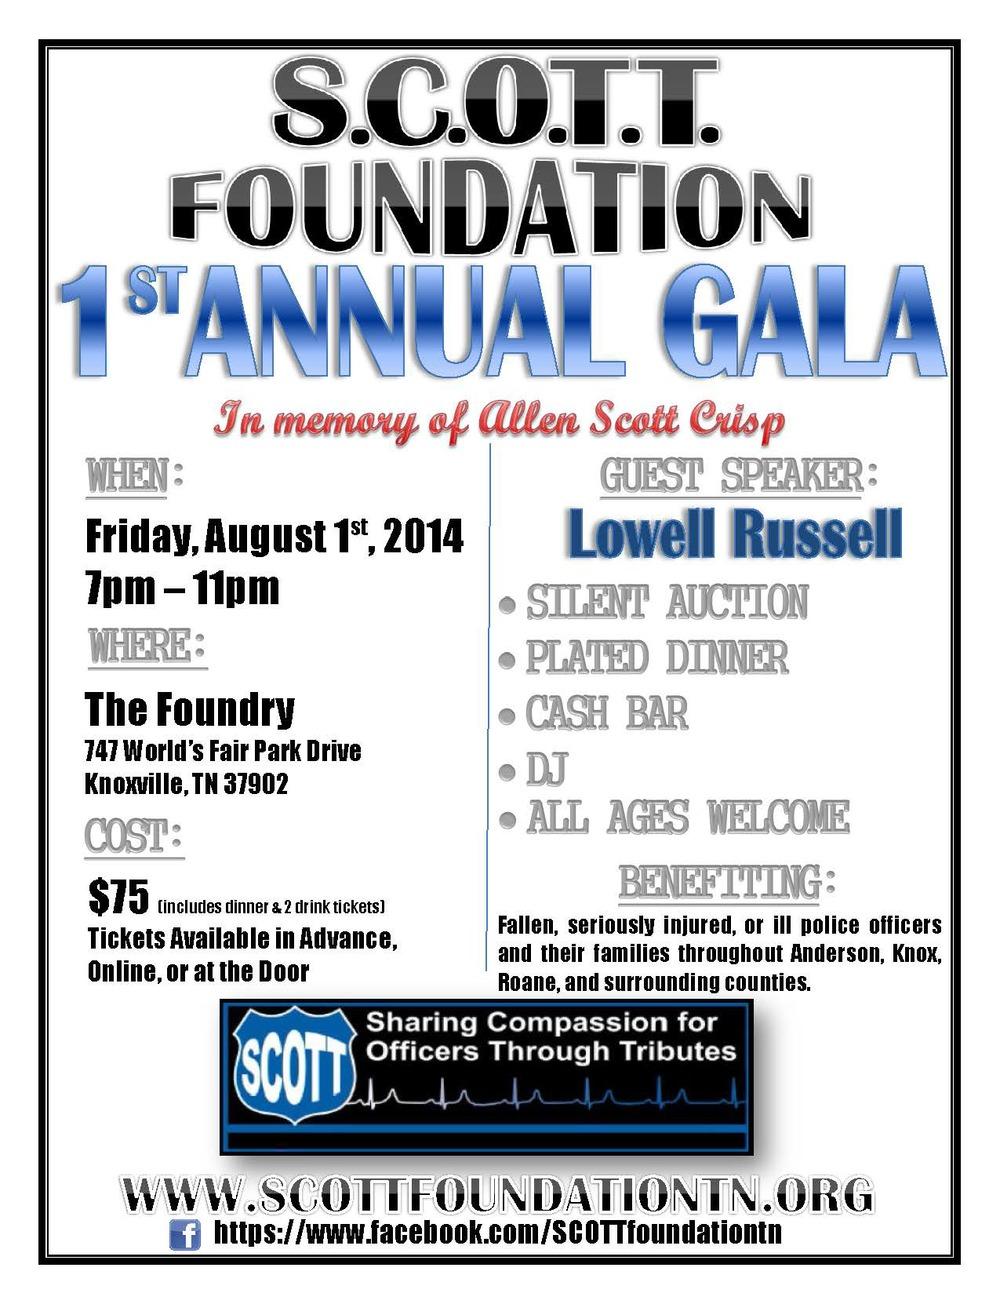 fundraiserimage2014